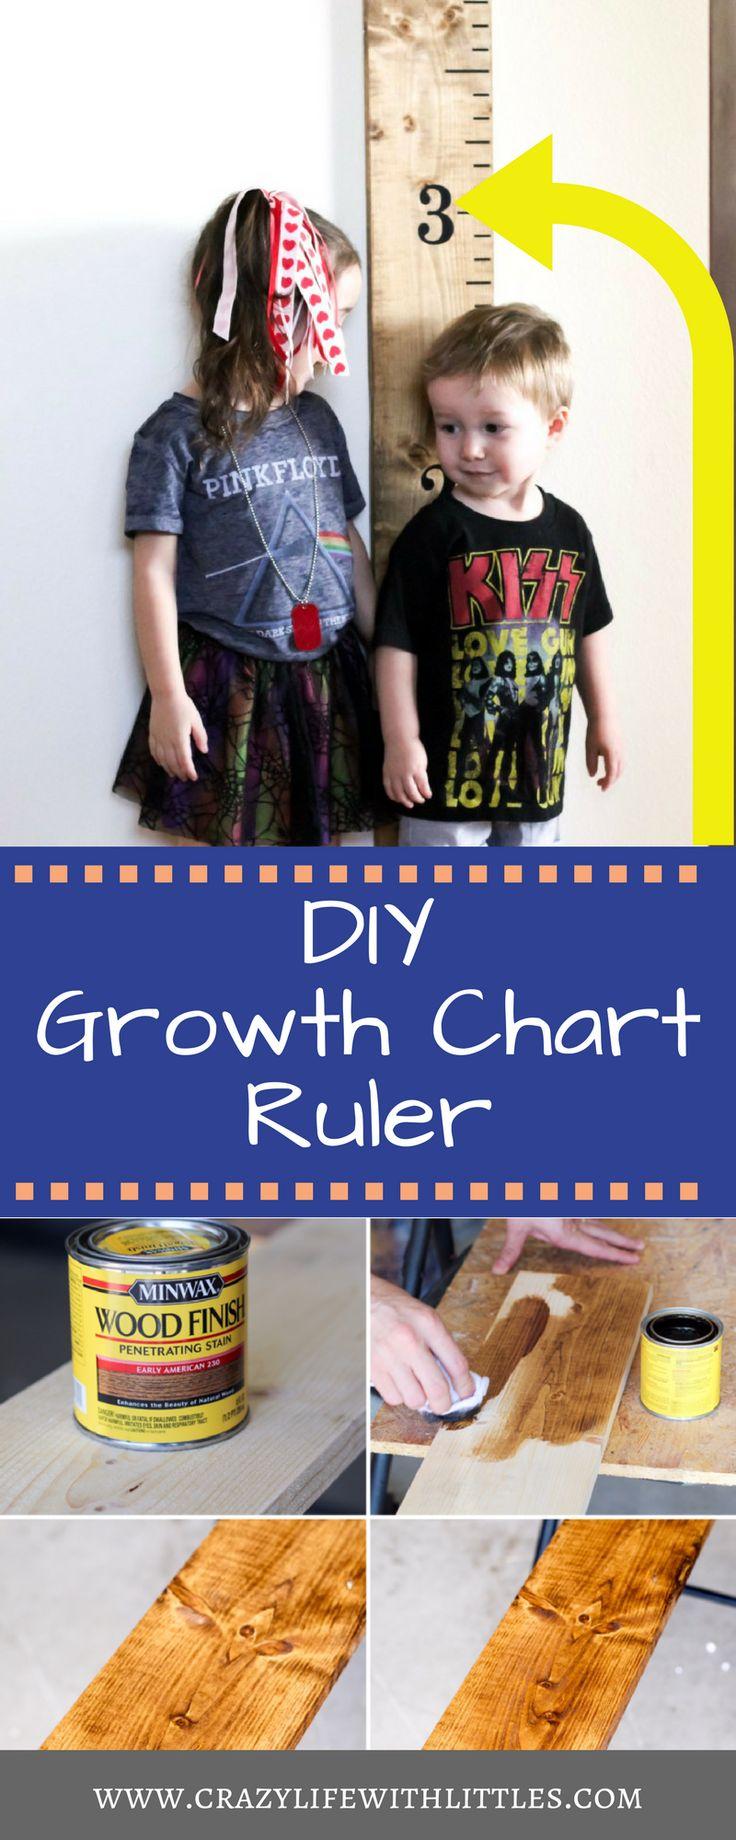 Pottery Barn Knockoff growth chart ruler, diy growth chart for kids, diy growth ruler, diy wooden growth ruler for kids, easy growth chart